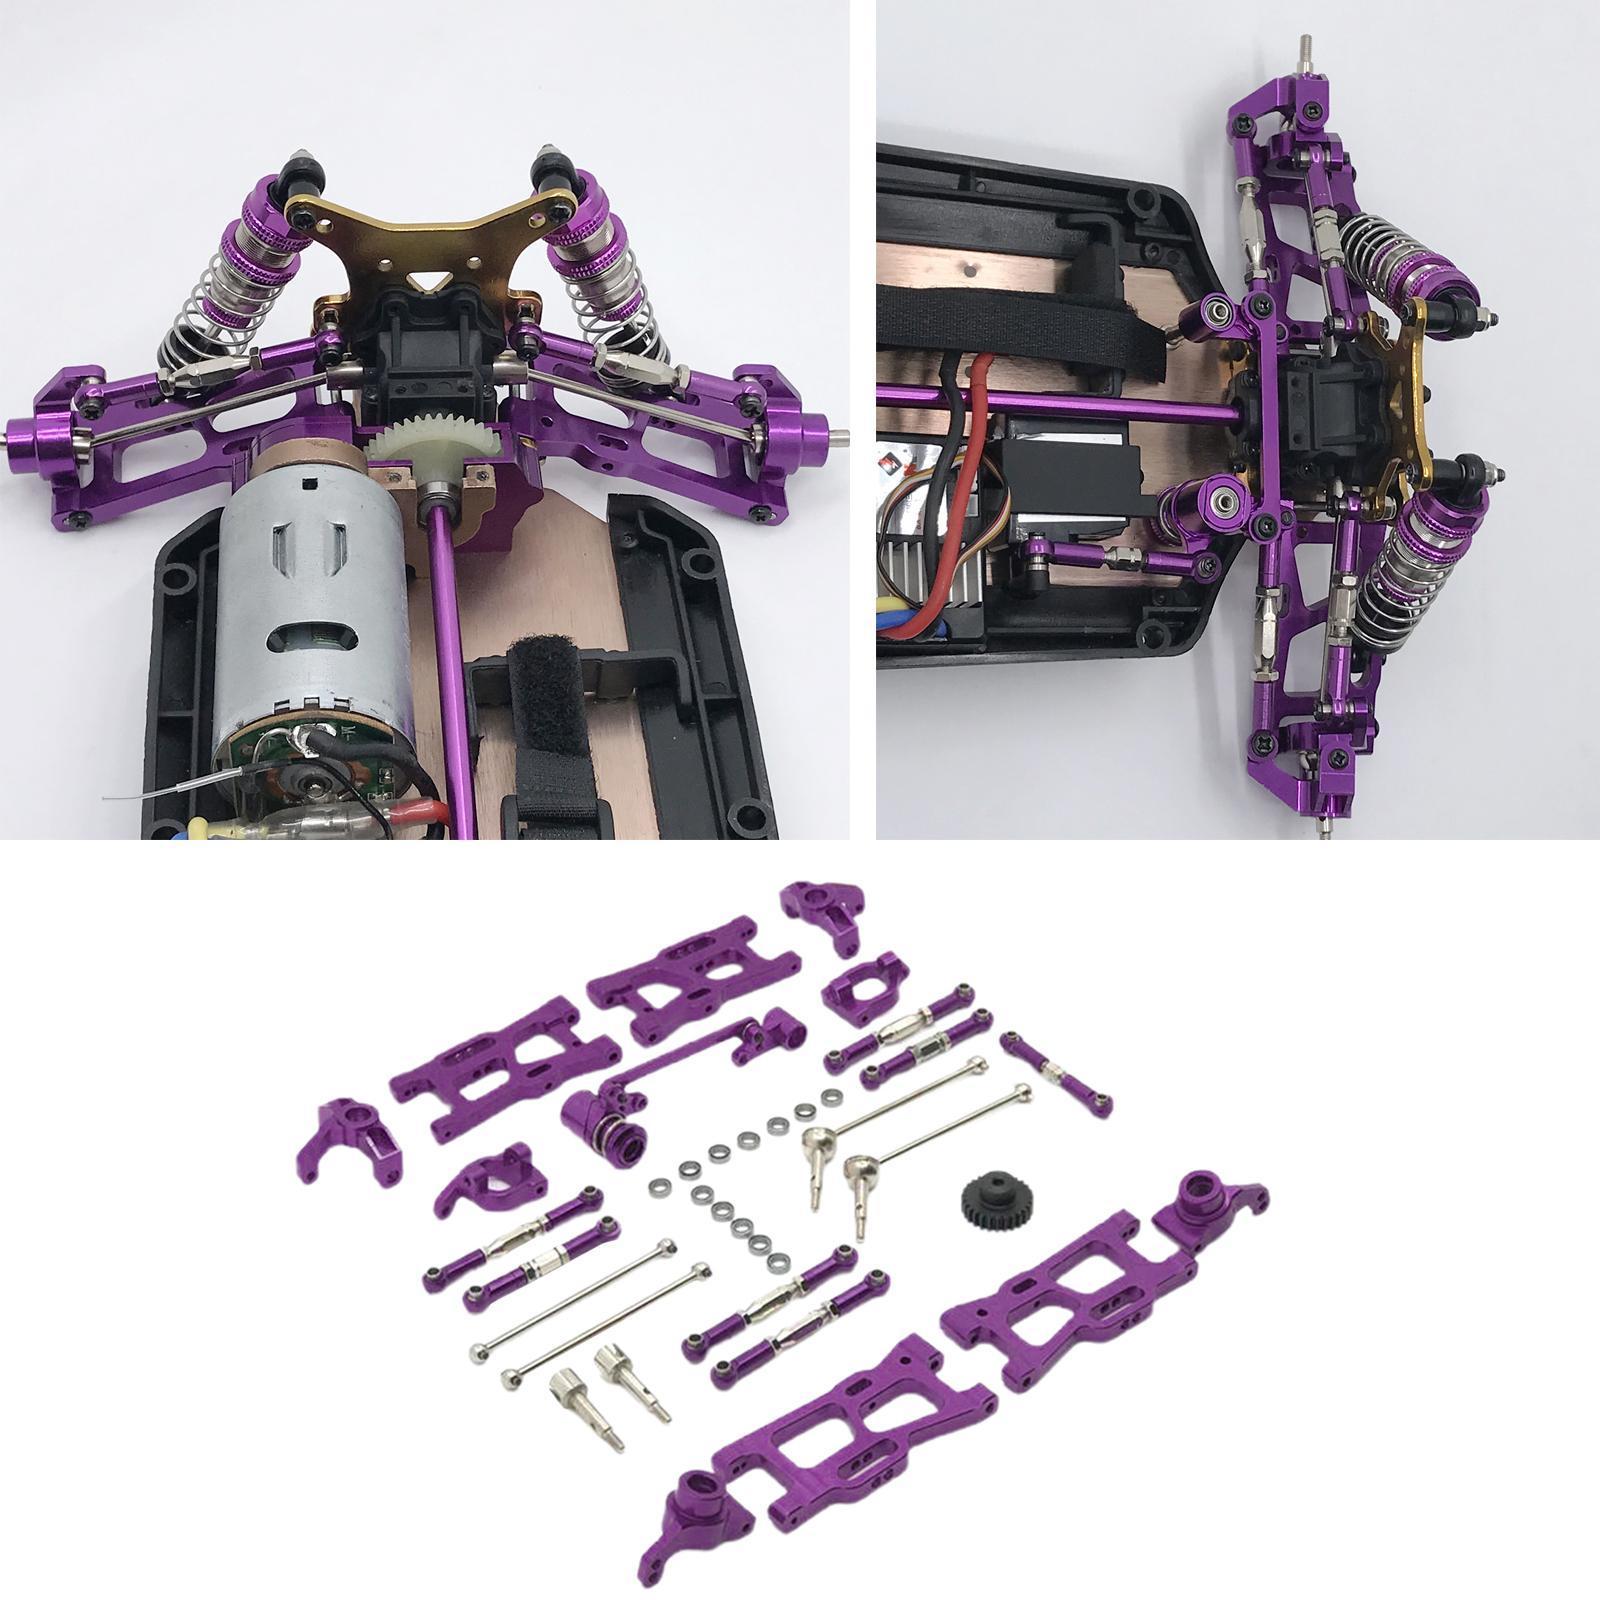 Metal Upgrades Parts Kit WLtoys 144001 124018 124019 Replaces Purple